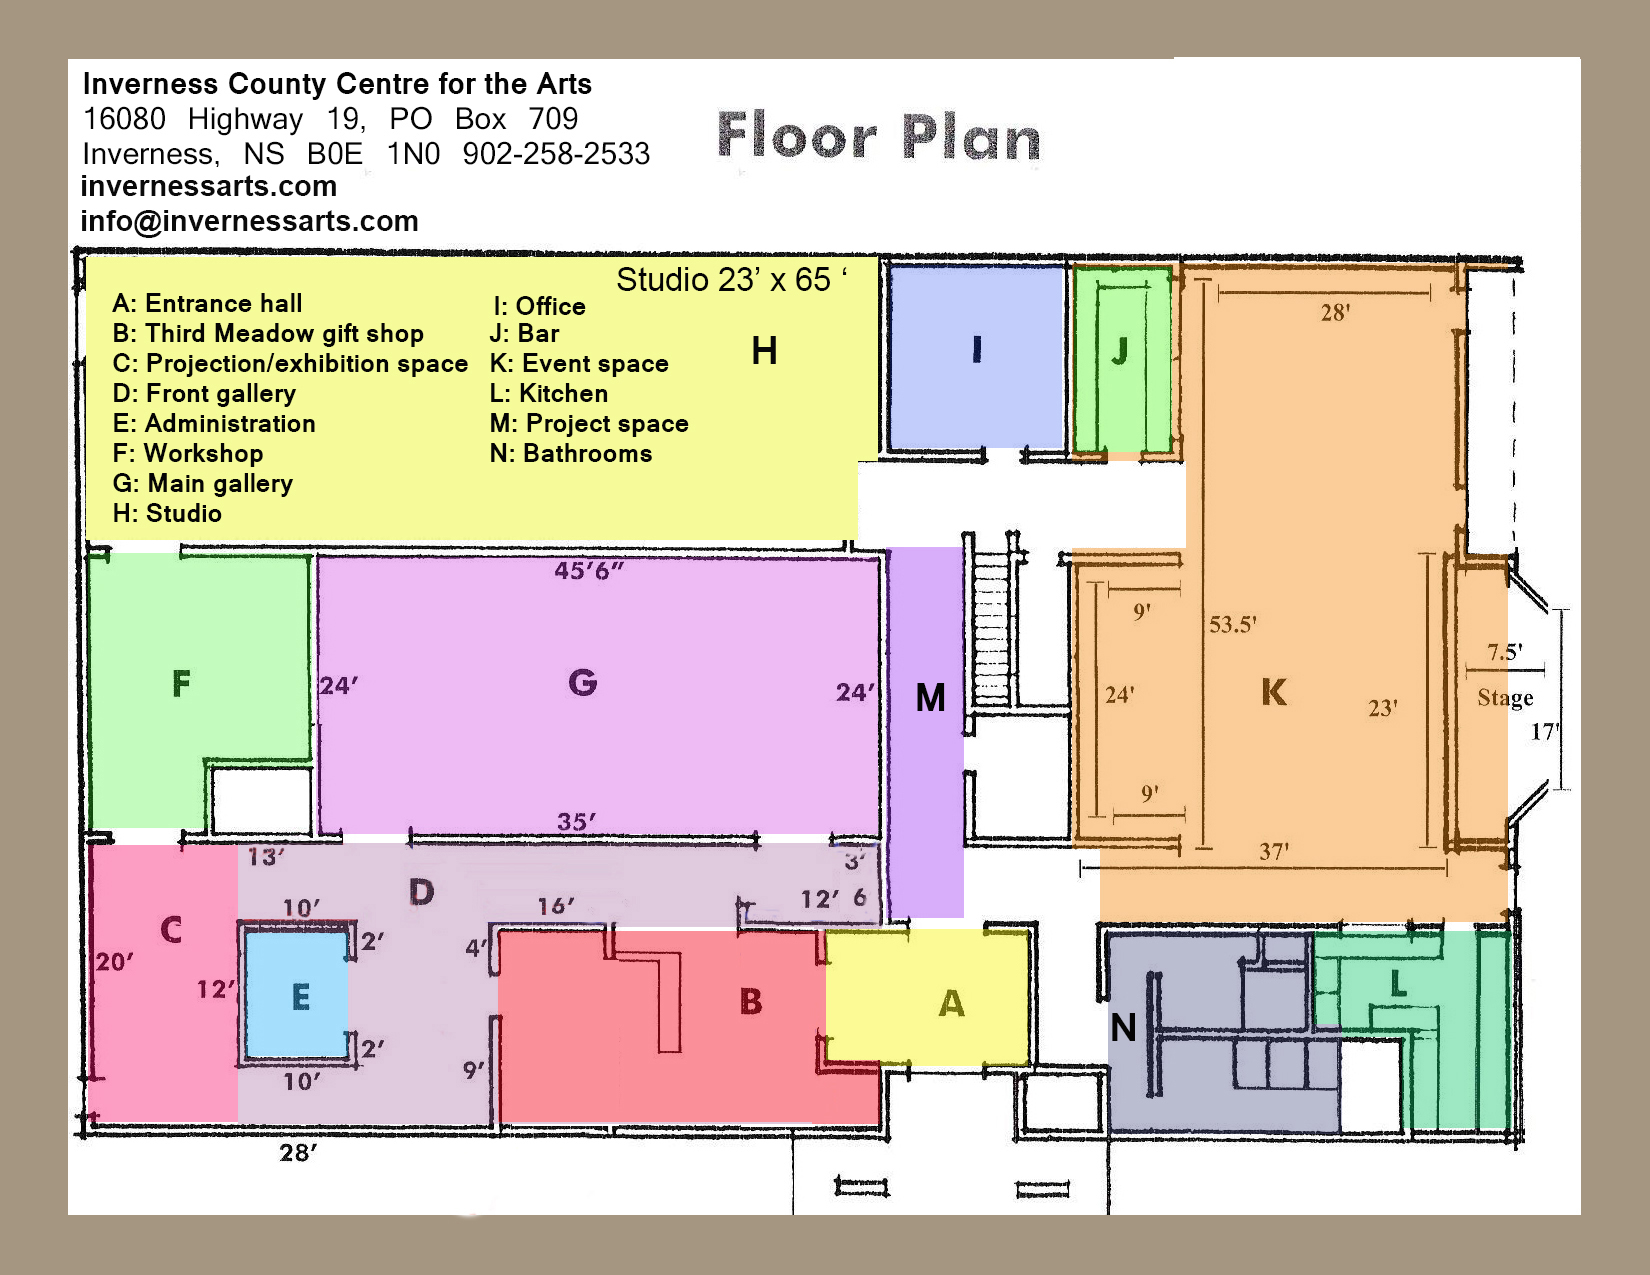 Floor-plan-ICCA-colour-dimensions.jpg